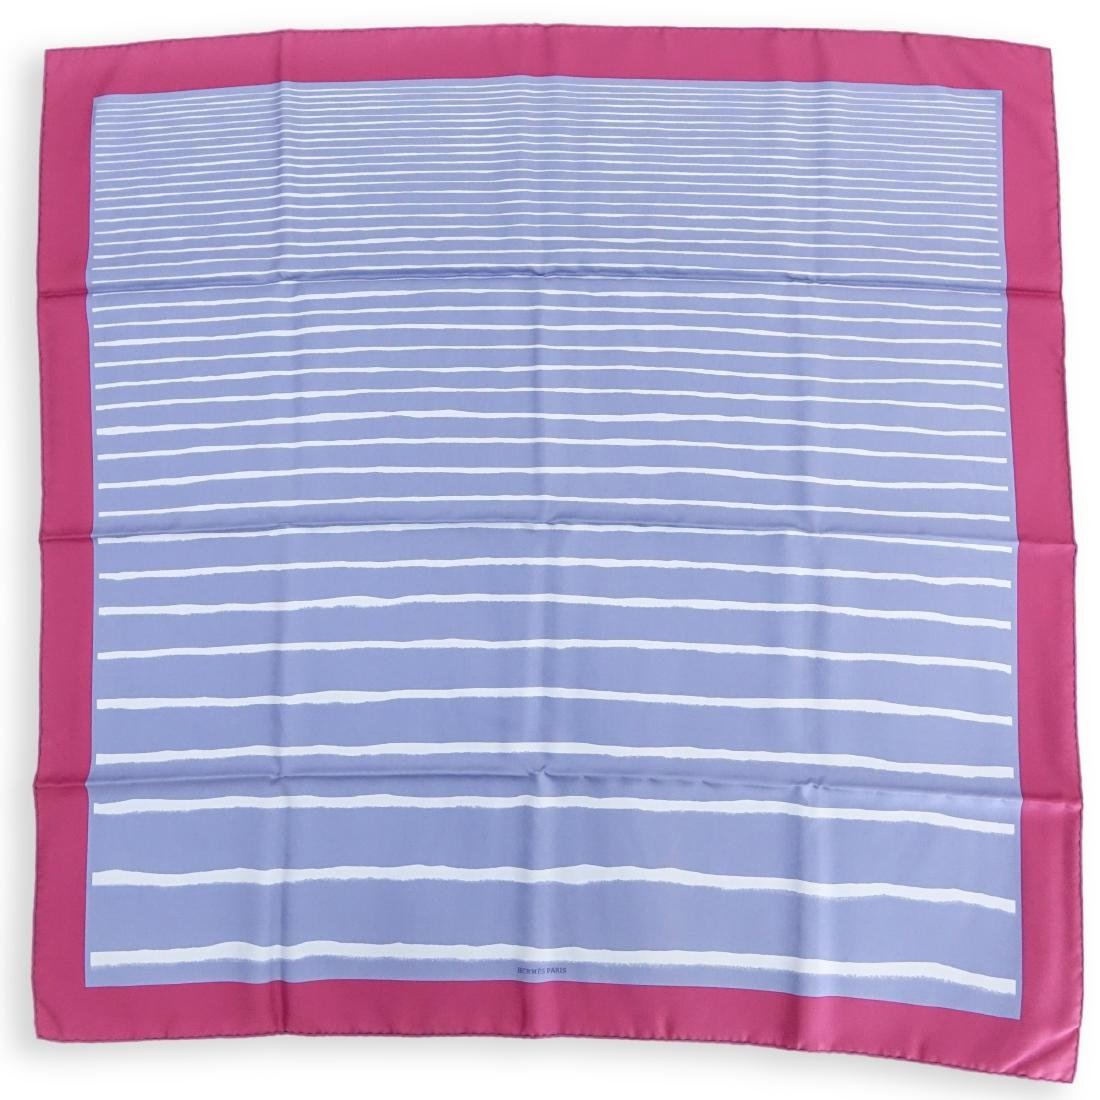 Hermes Gradient Stripe Twill Silk Scarf